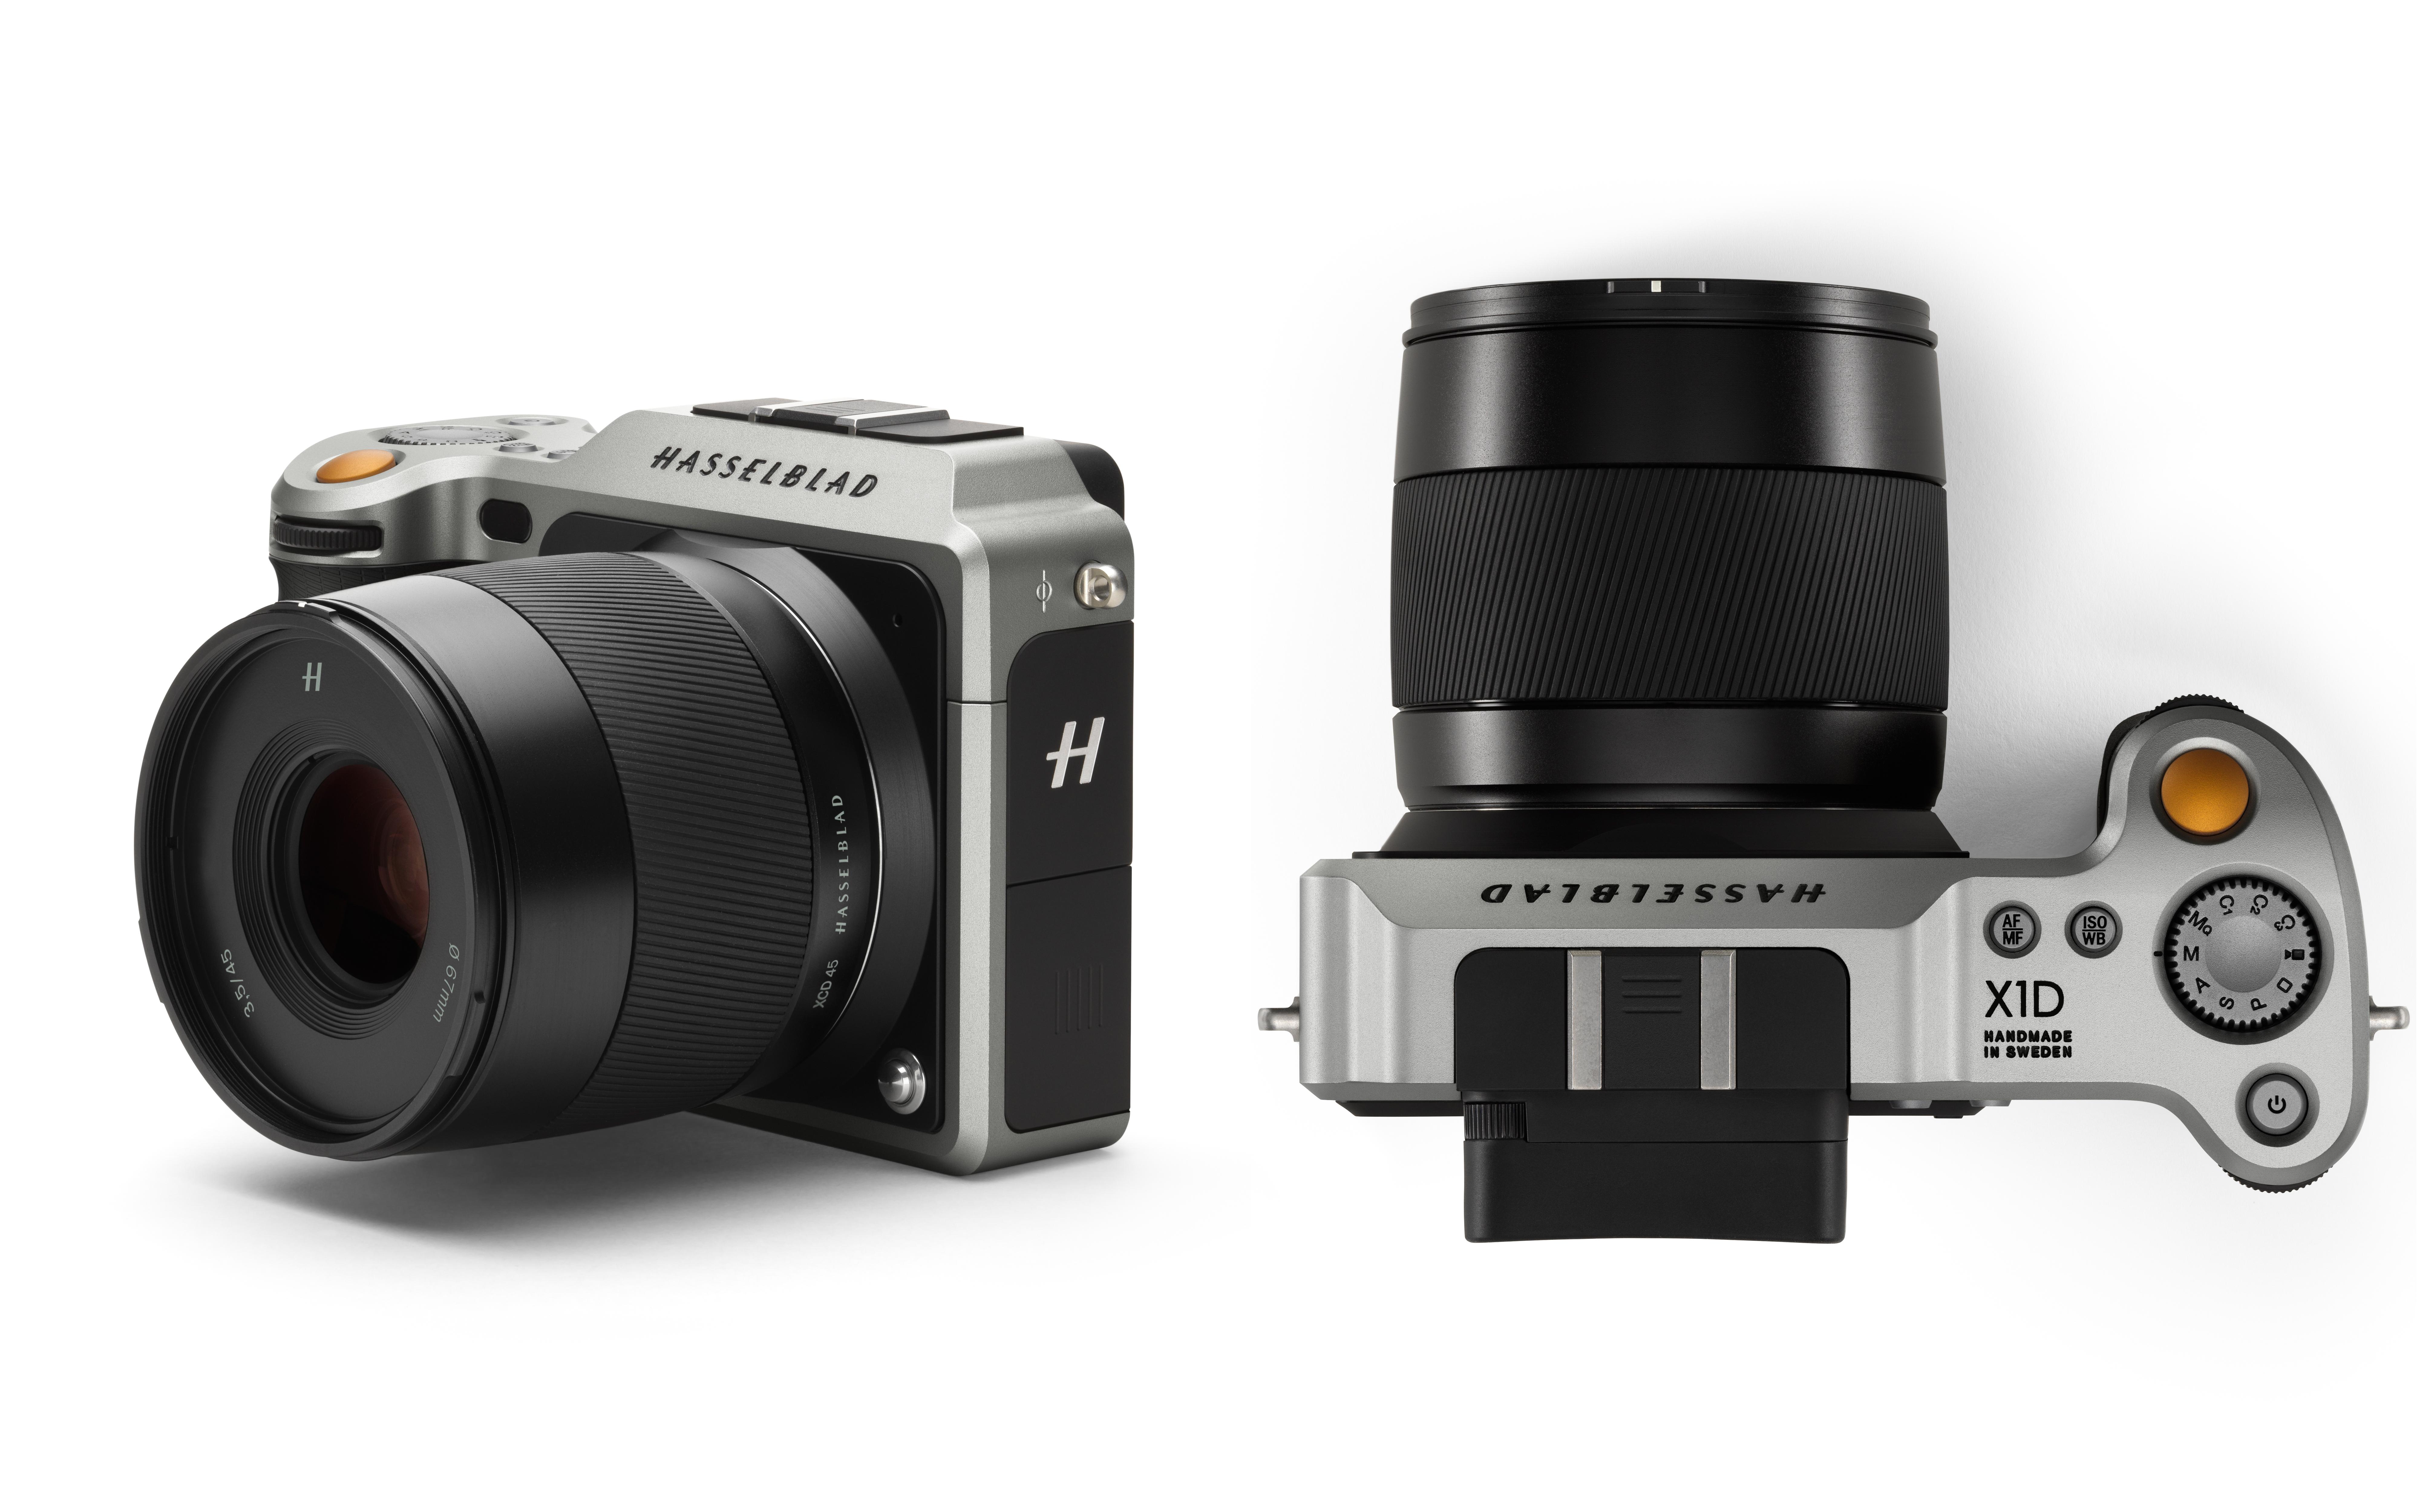 SAMPLE IMAGES INCLUDED: Hasselblad Announces Medium Format